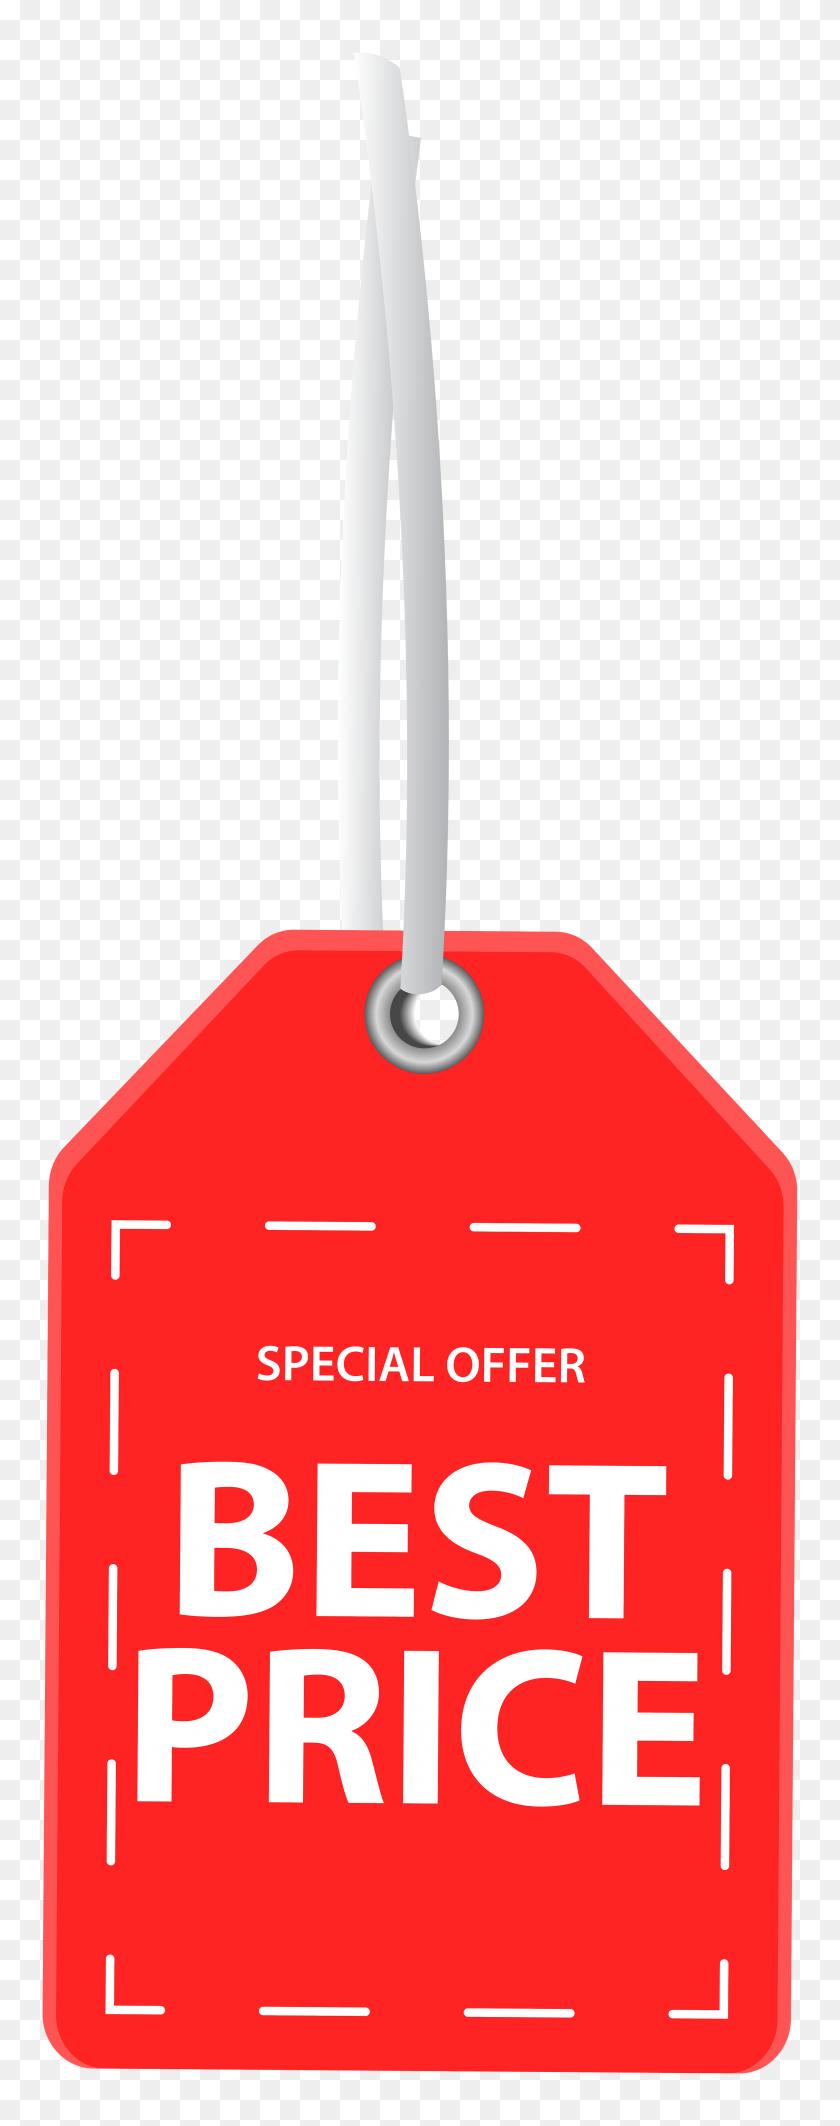 Price Tag Png Transparent Images - Sale Tag Clip Art